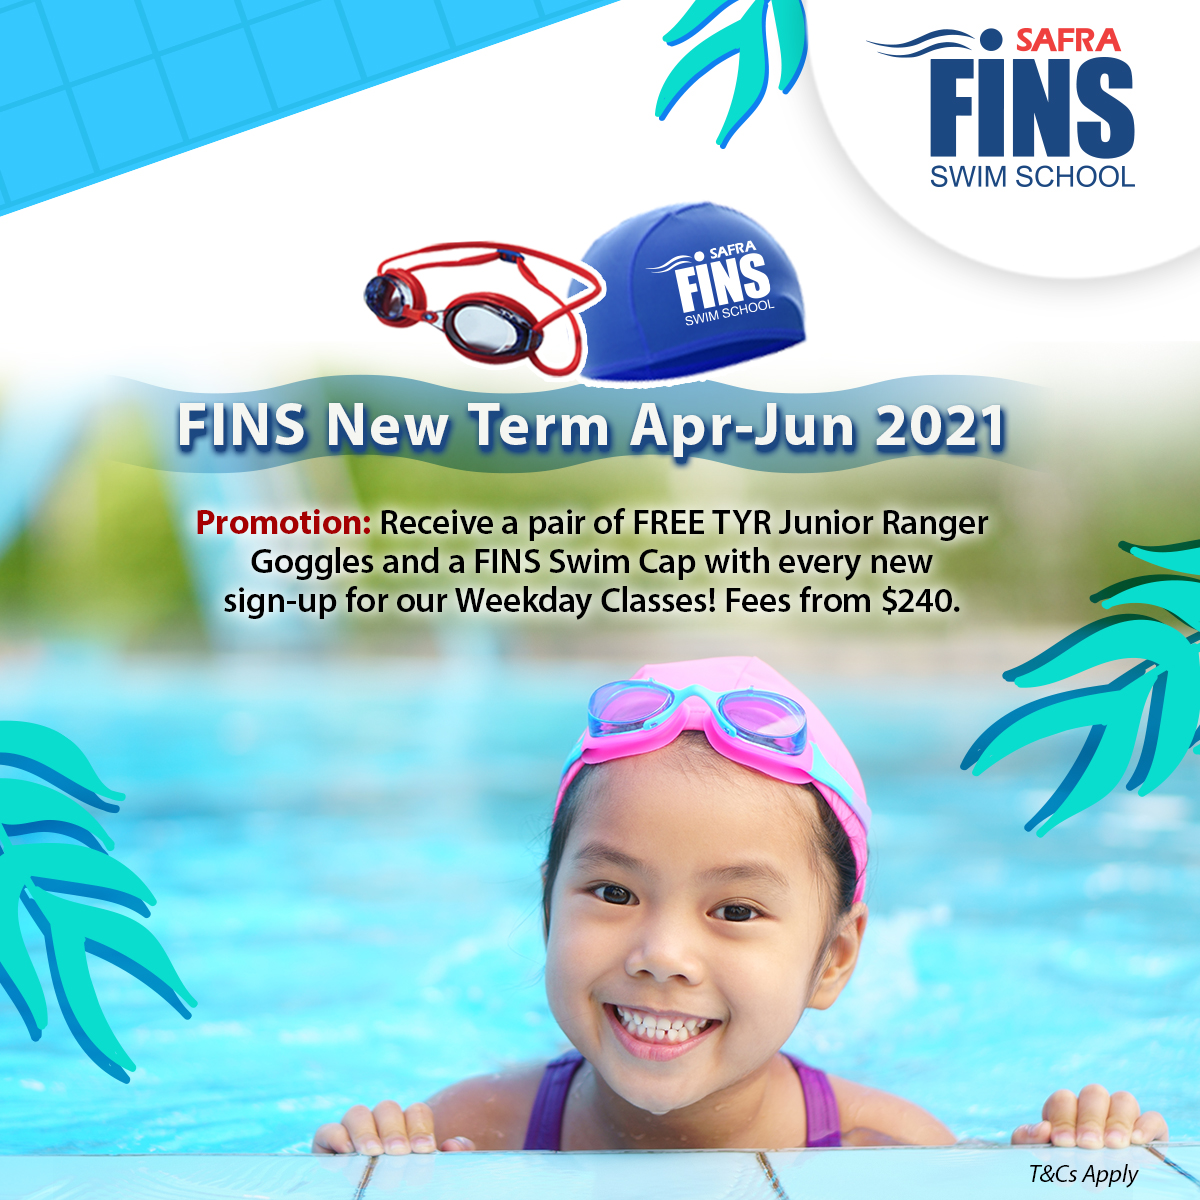 FINS Swim School – Sign Up Apr-Jun 2021 Weekday Classes To Receive A Free Pair Of TYR Junior Ranger Goggles + FINS Swim Cap